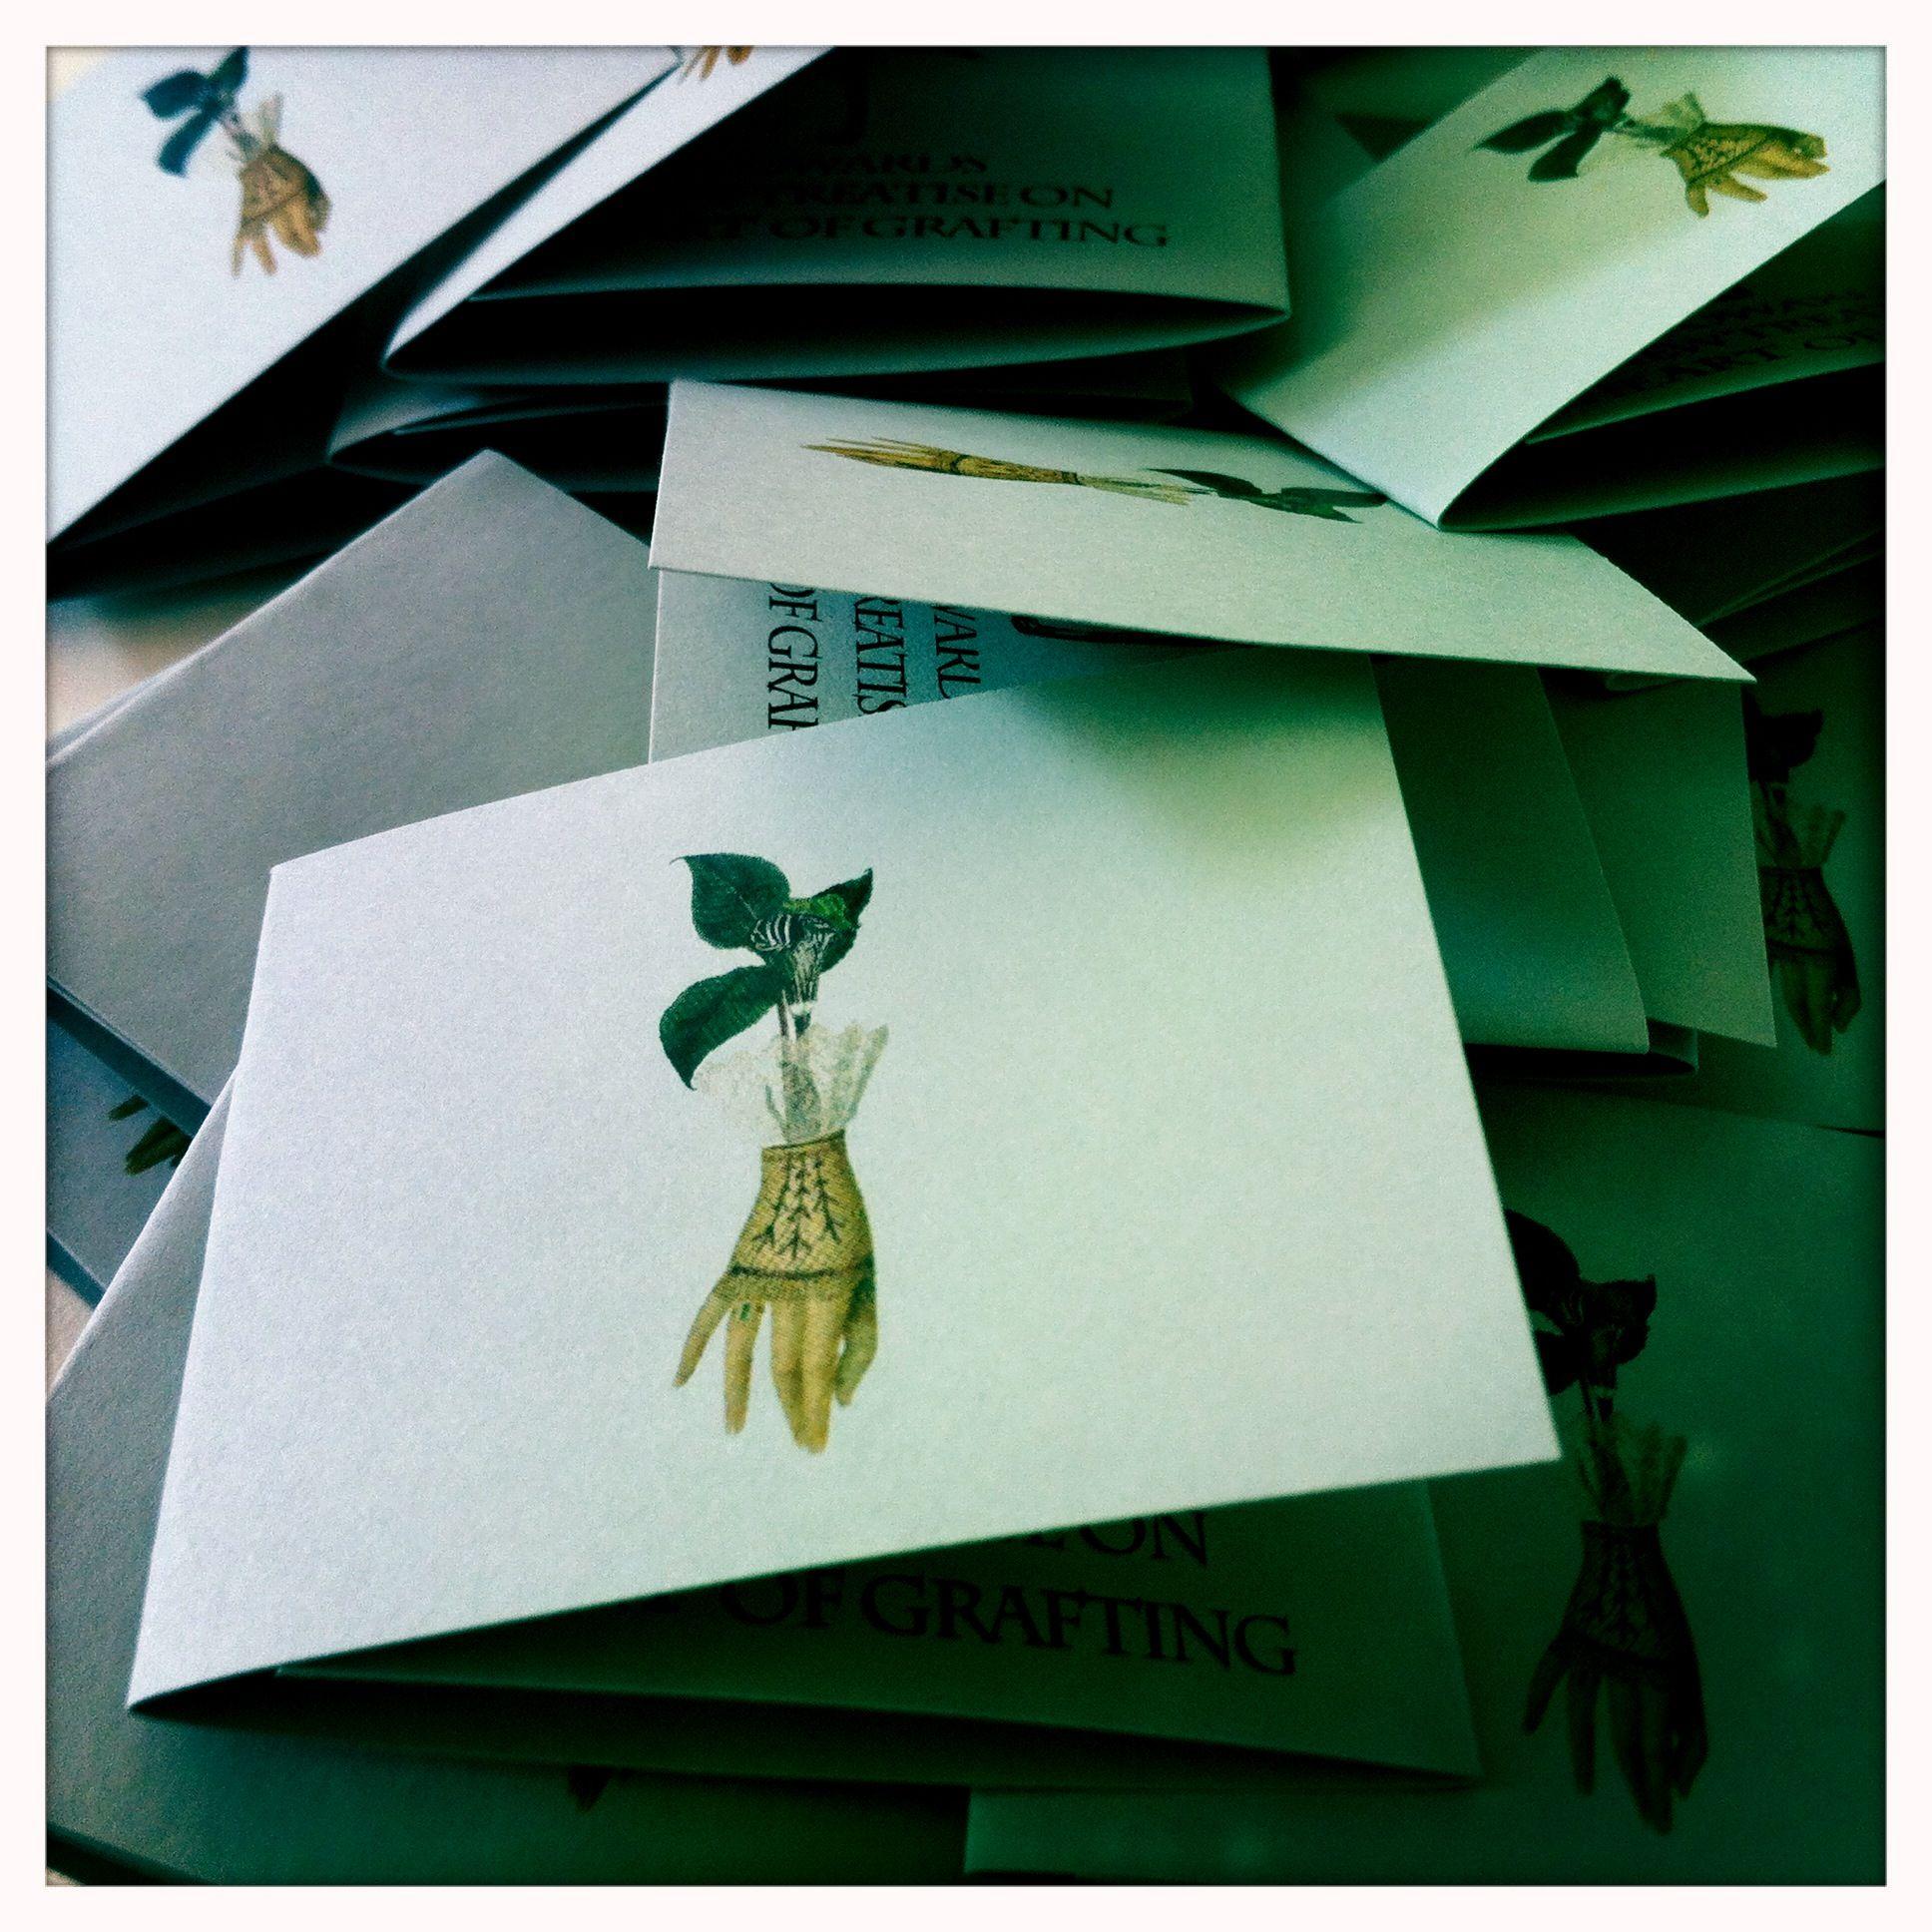 The Plantarum: Empathic Limb Clinic for Proximity Festival, PICA, Perth 2013. Image Cat Jones